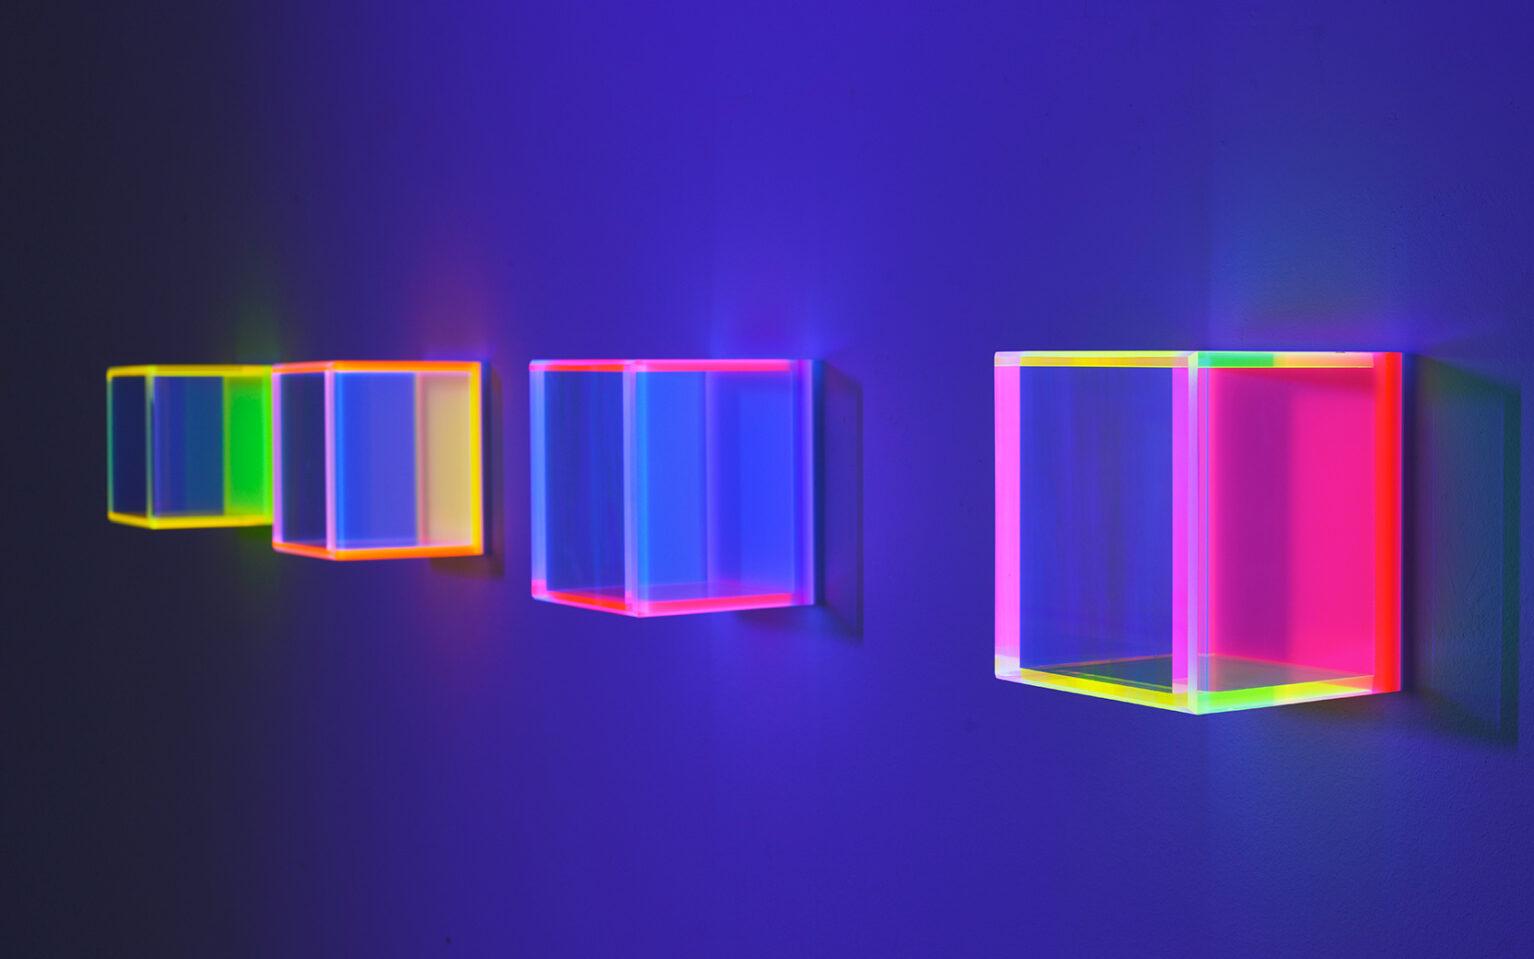 Tq Regine Schumann Colormirror Rainbow Full Series 2020